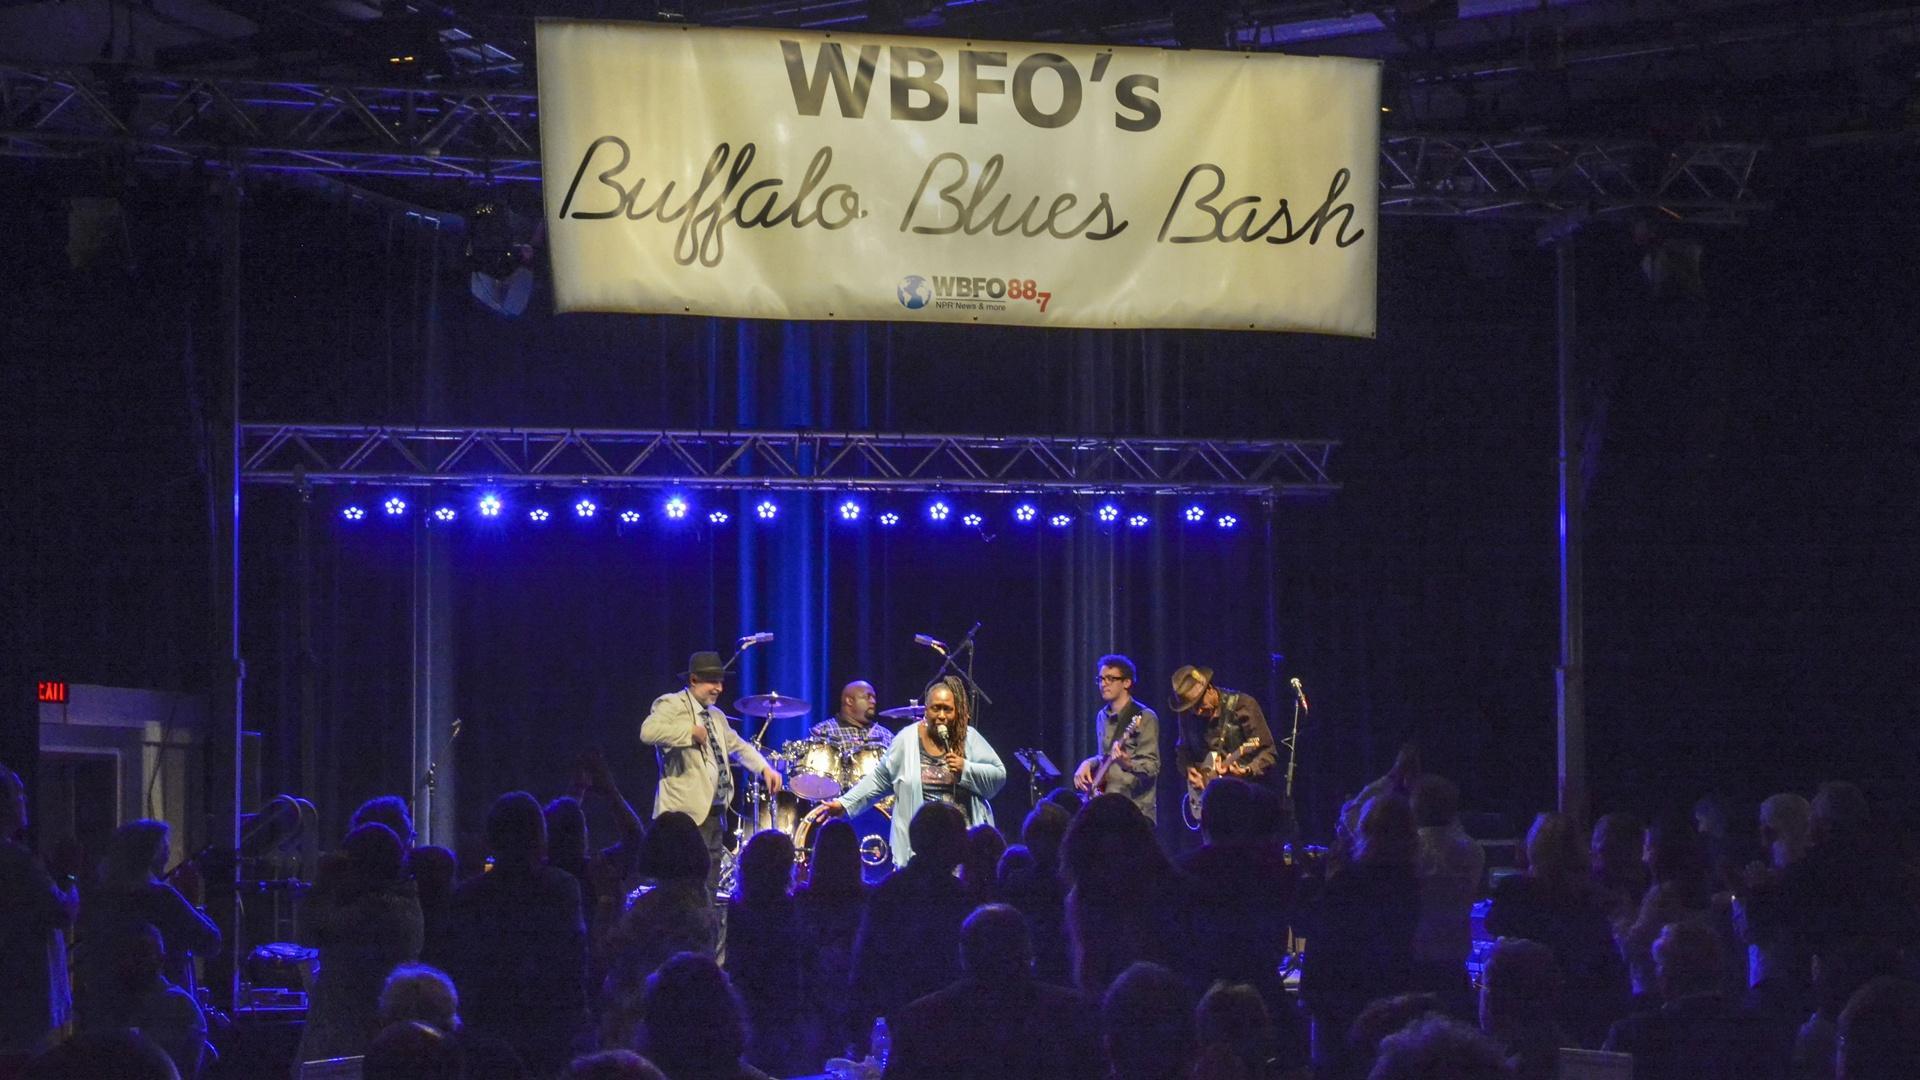 WBFO's Buffalo Blues Bash April 2019